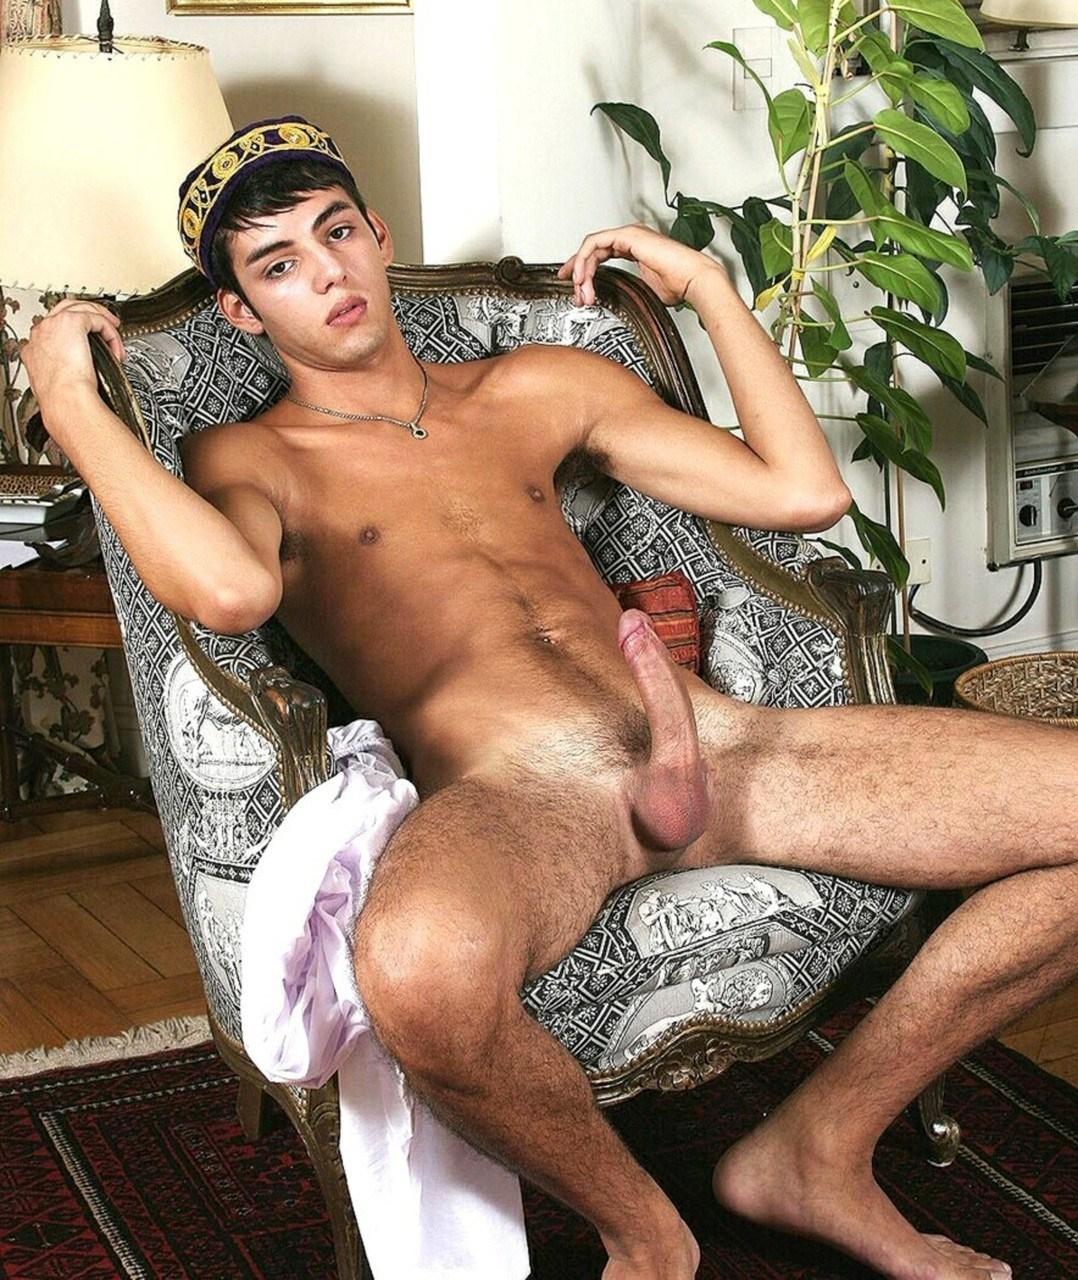 Prince of persia cartoon sex pic sexy photos